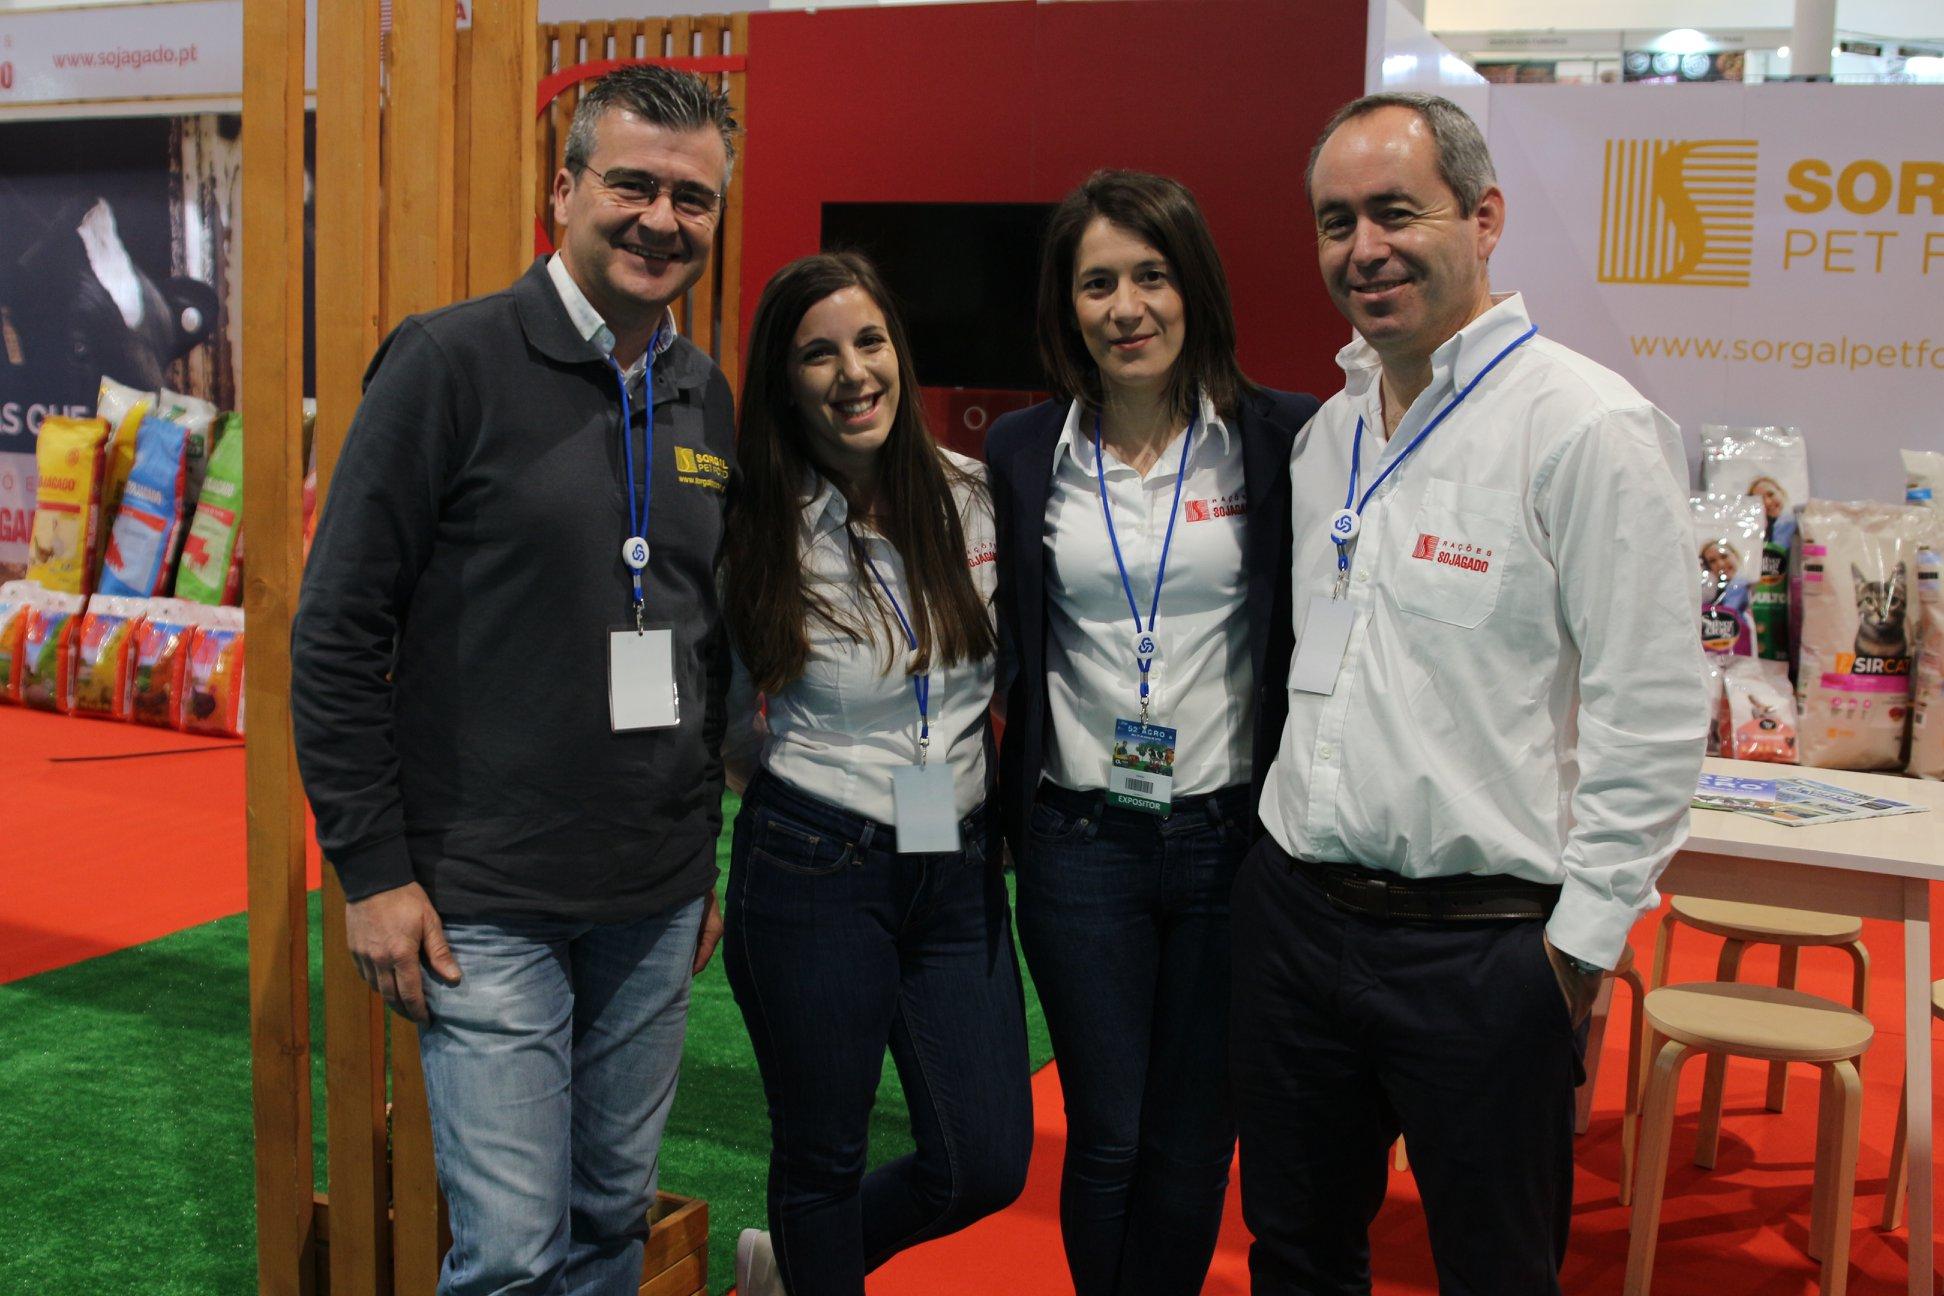 SOJAGADO e SORGAL PET FOOD marcam presença na AGRO Braga 2019